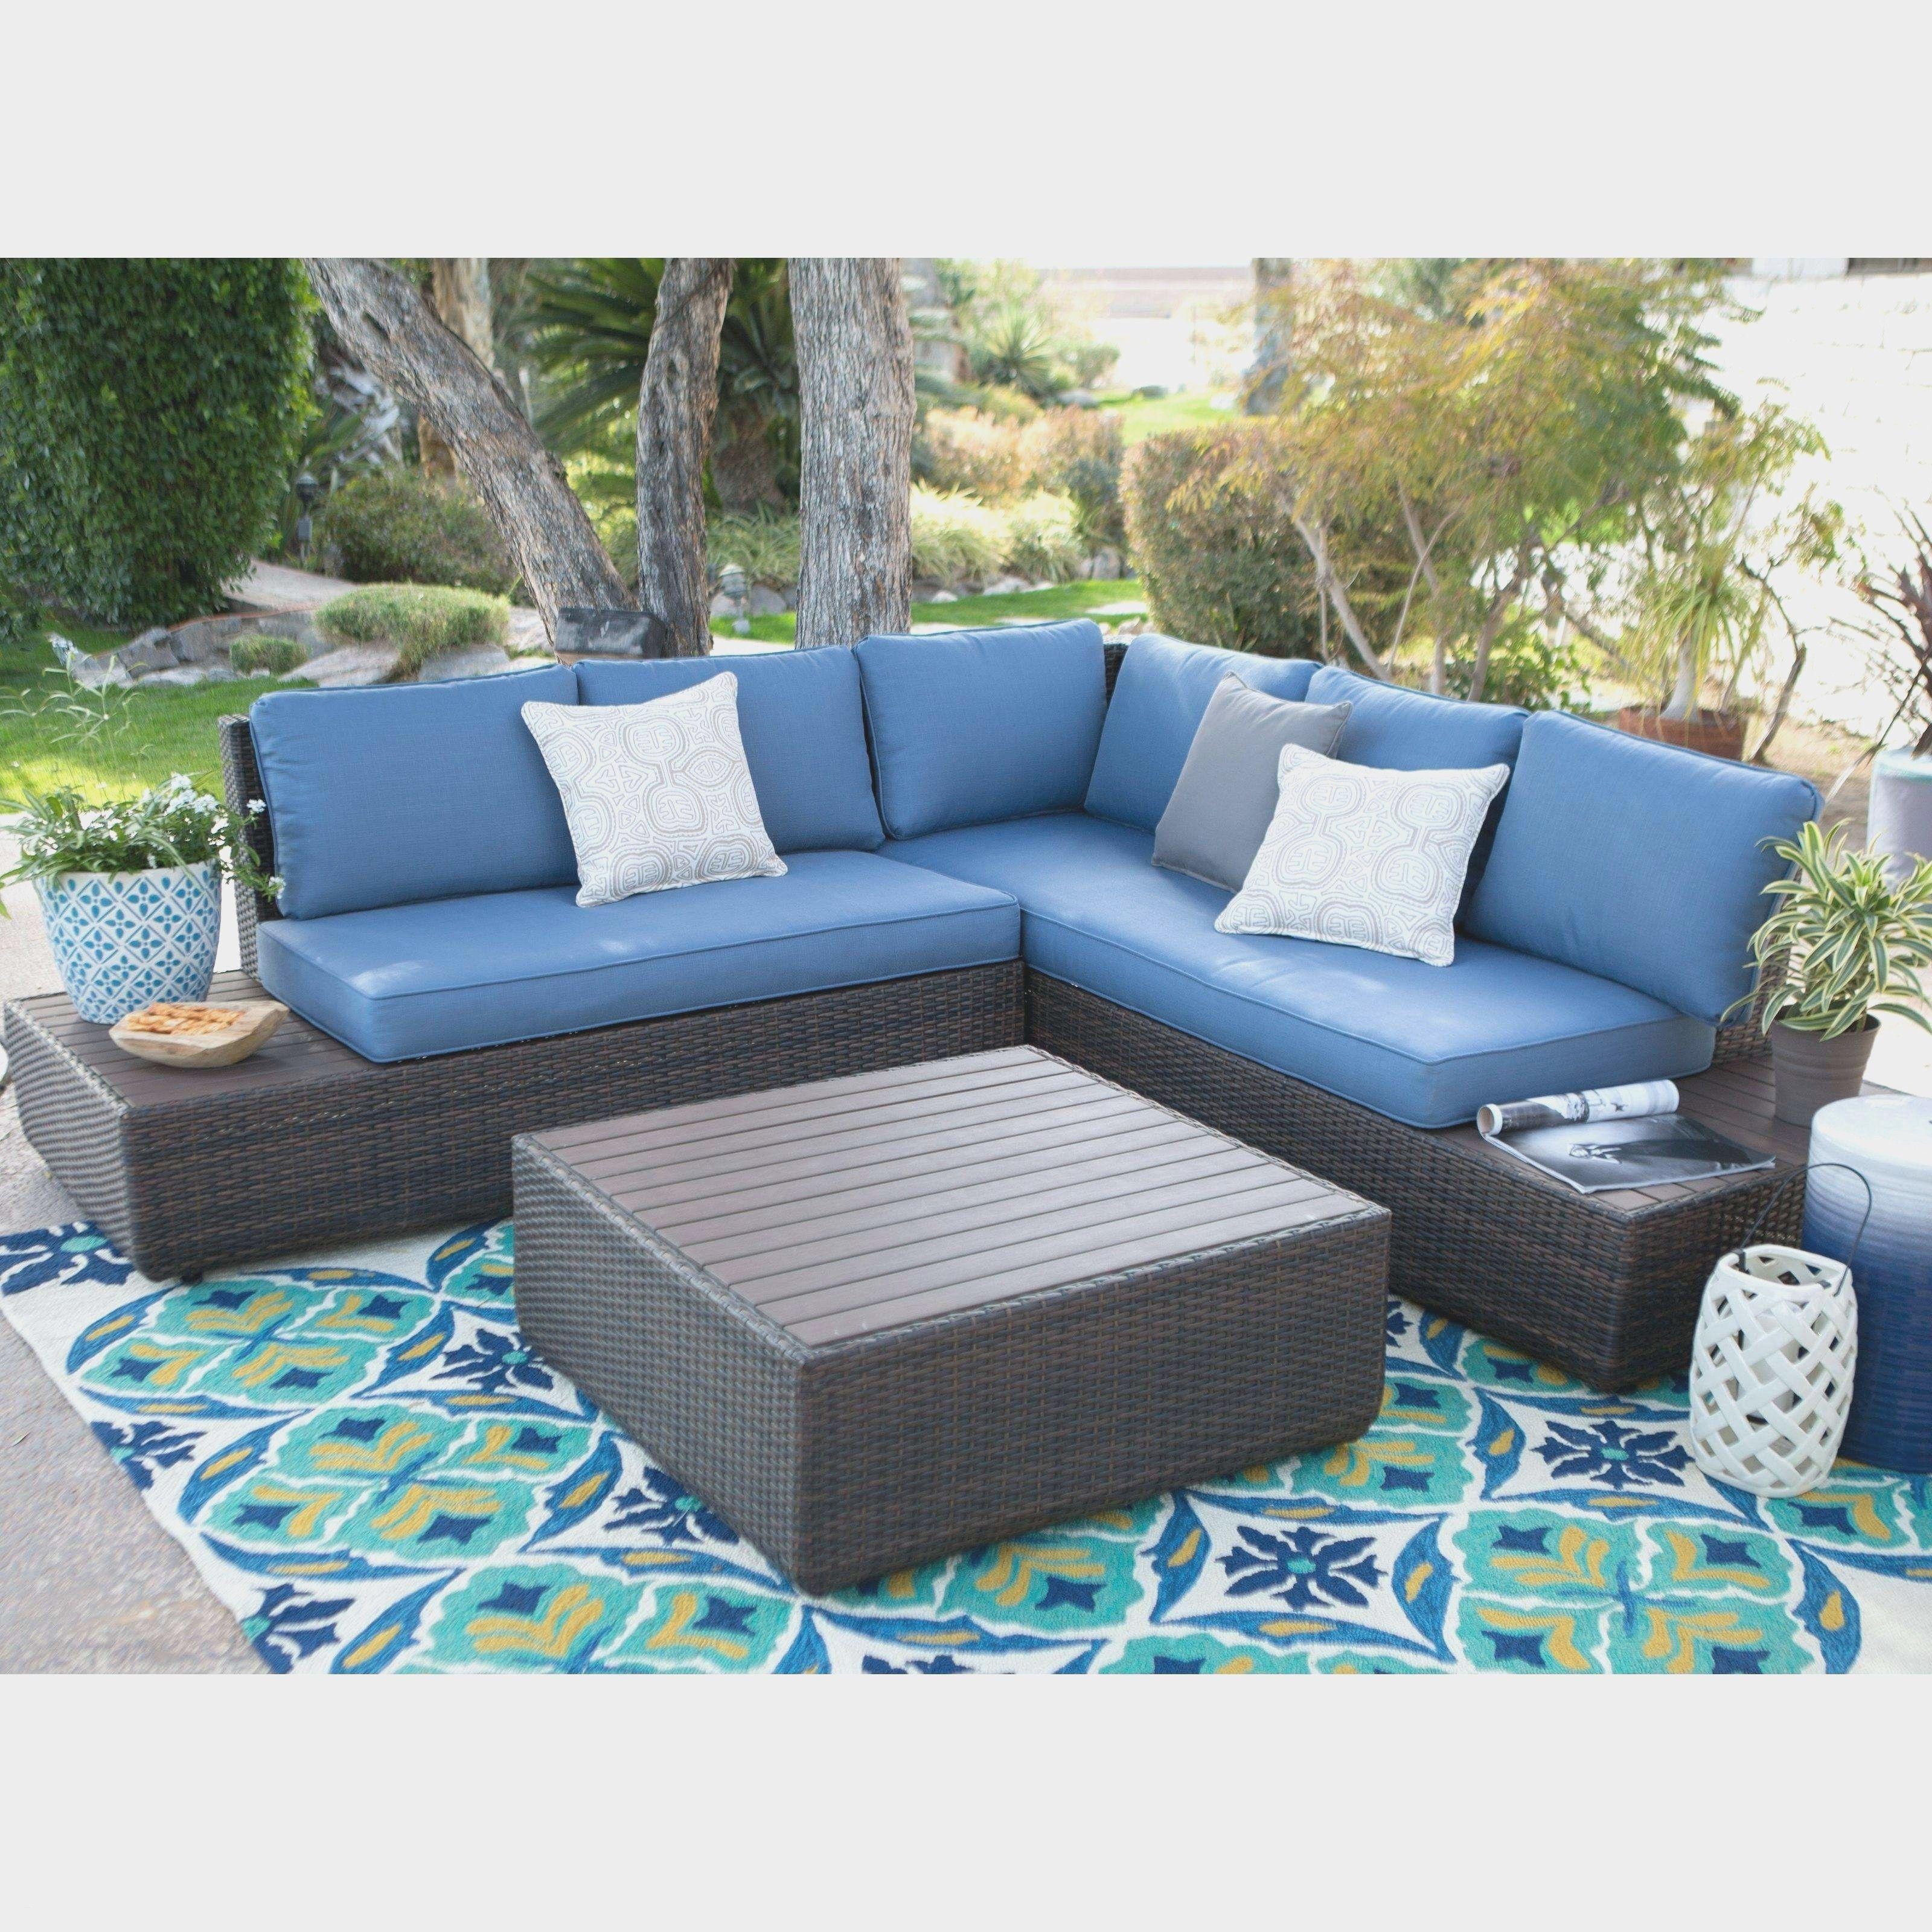 Best Patio Furniture Brands 2018 Patio Ideas Pinterest Sofa